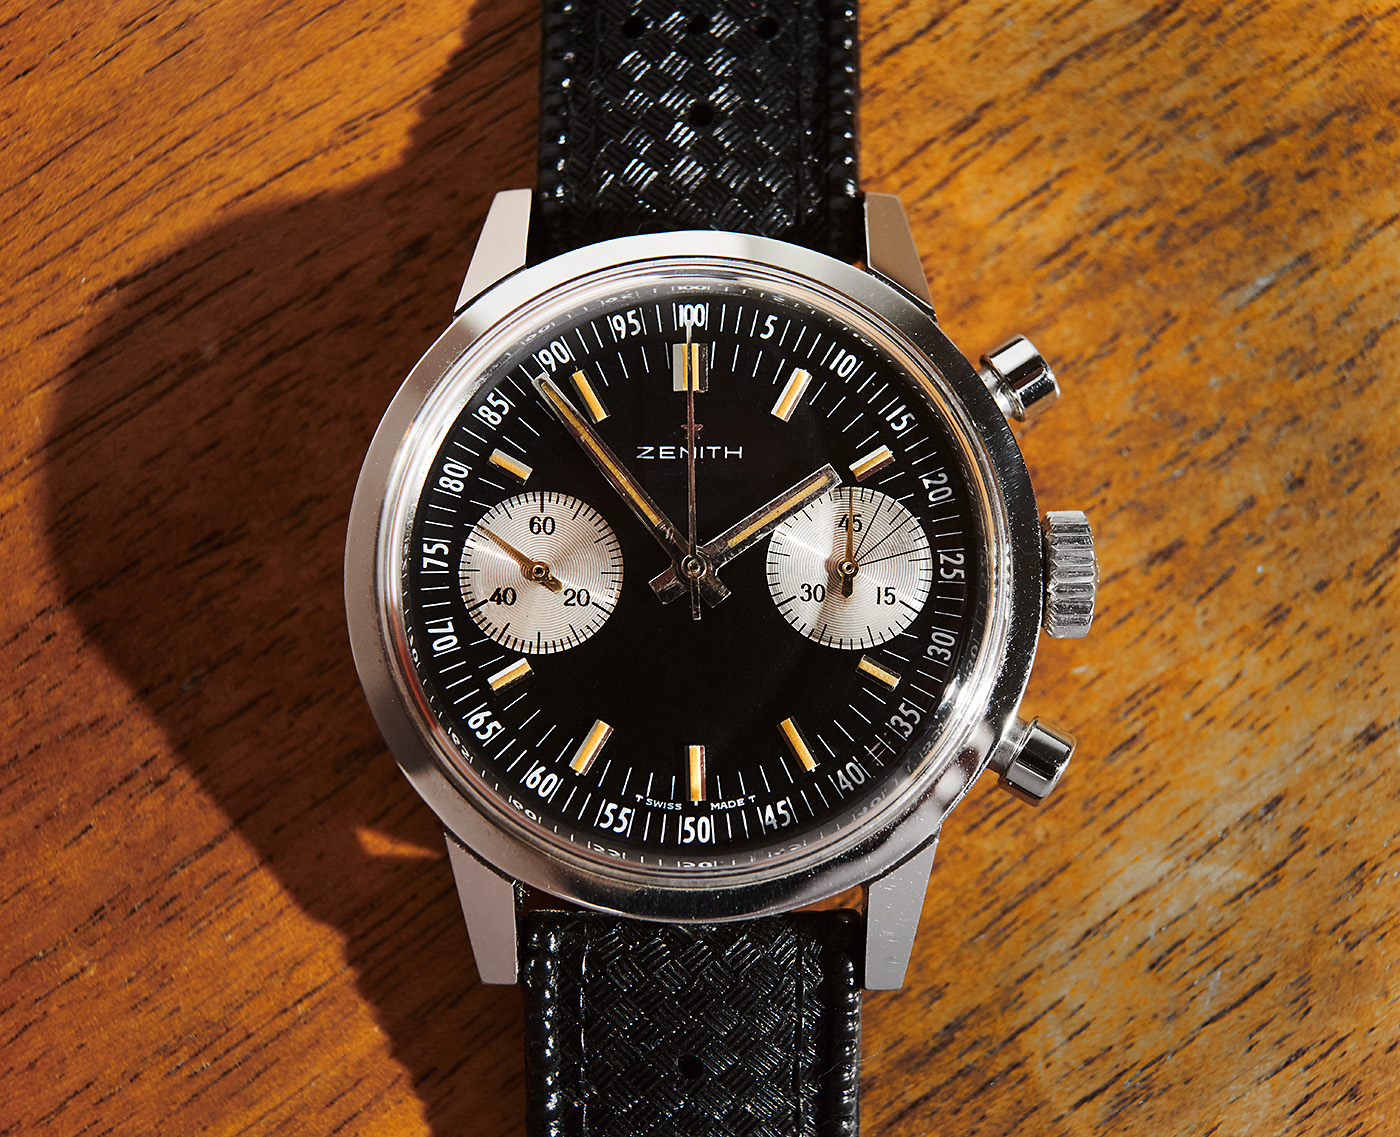 Zenith 146D Chronograph 1960s